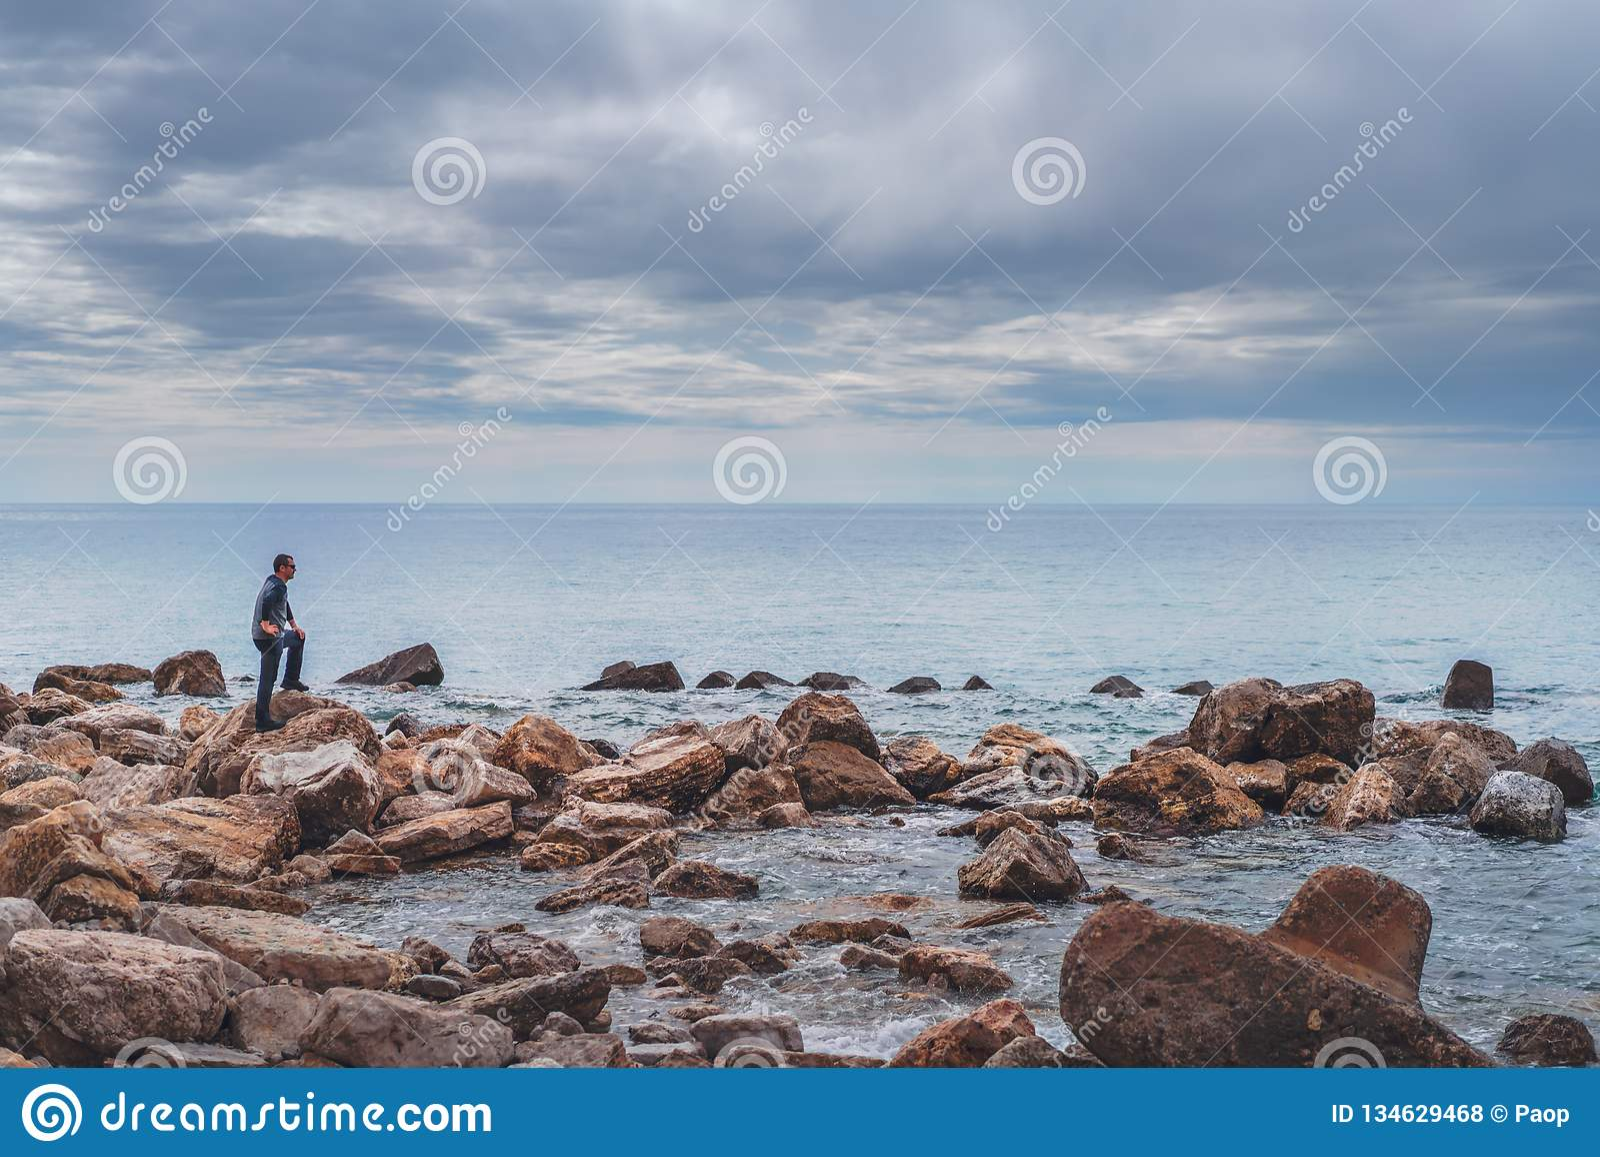 Tourist on the rocky coast in Montenegro